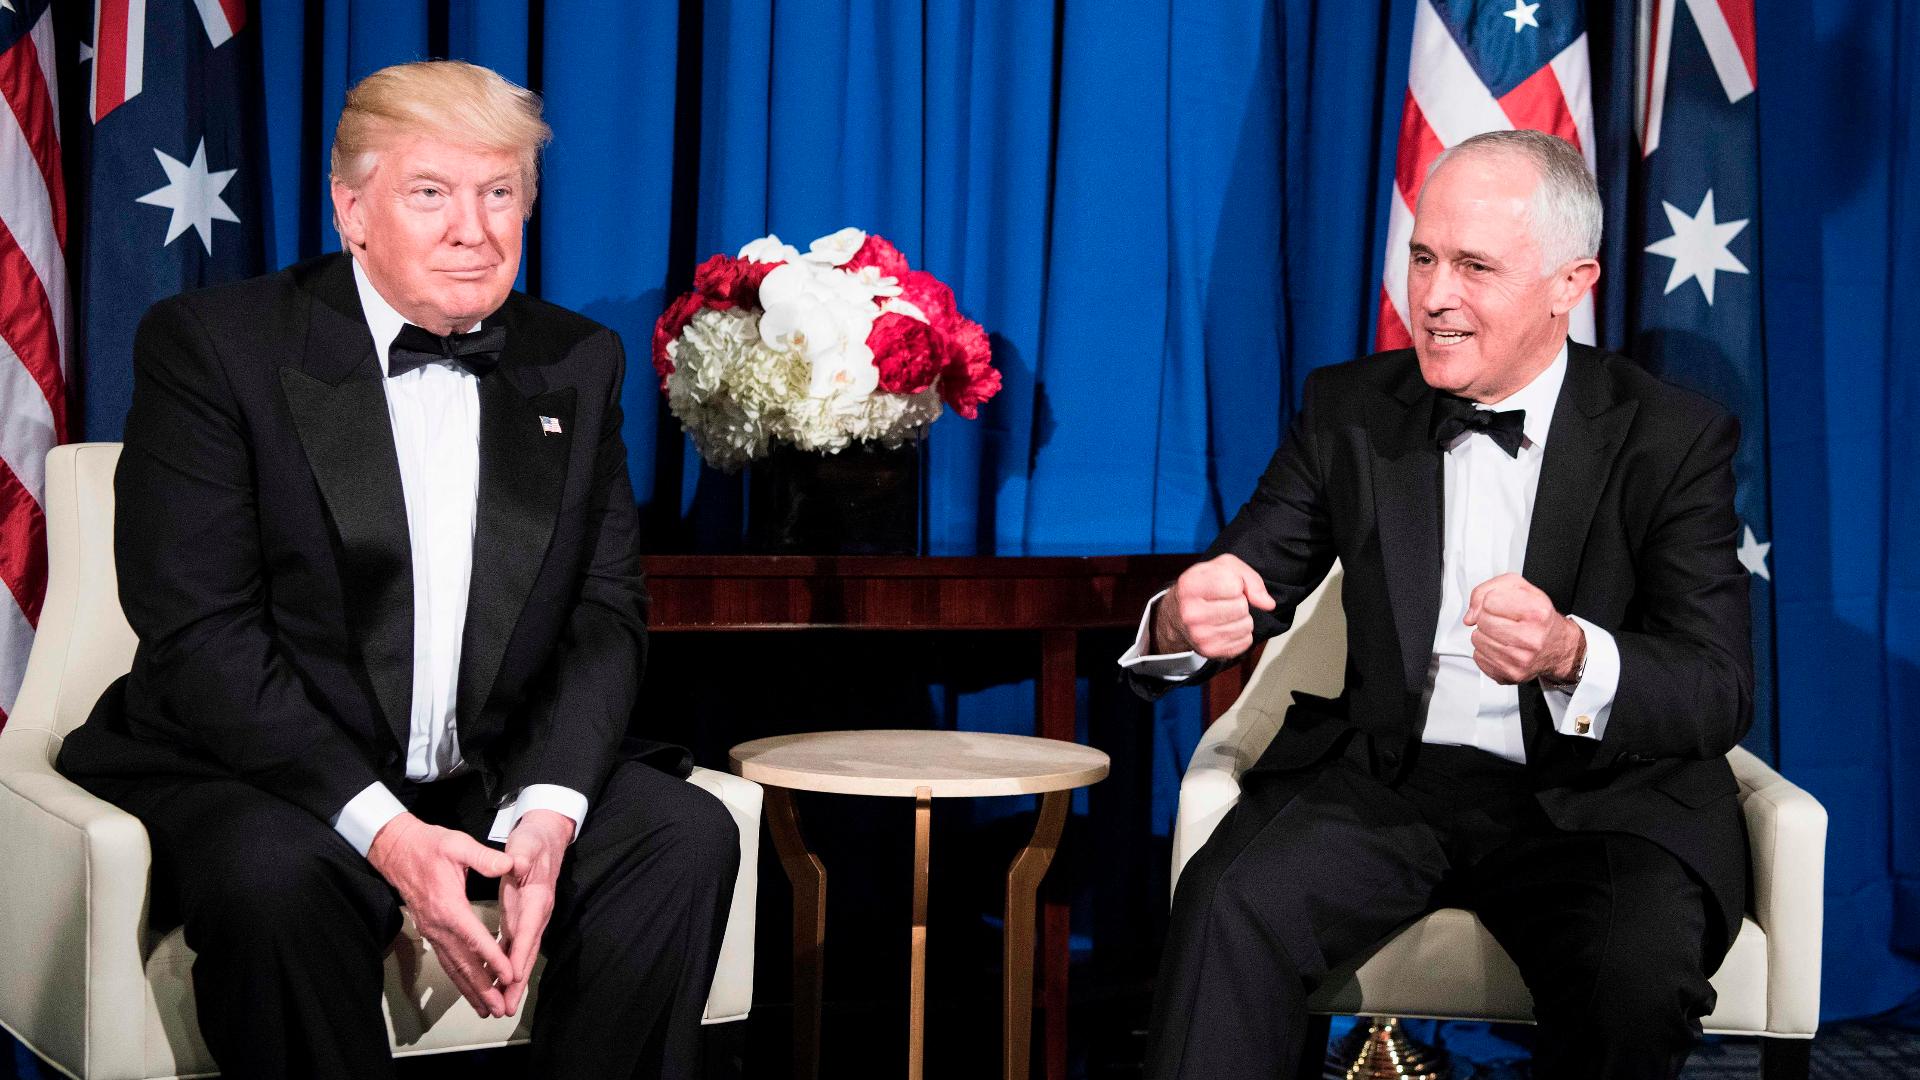 Trump's forbidden love: Single-payer health care